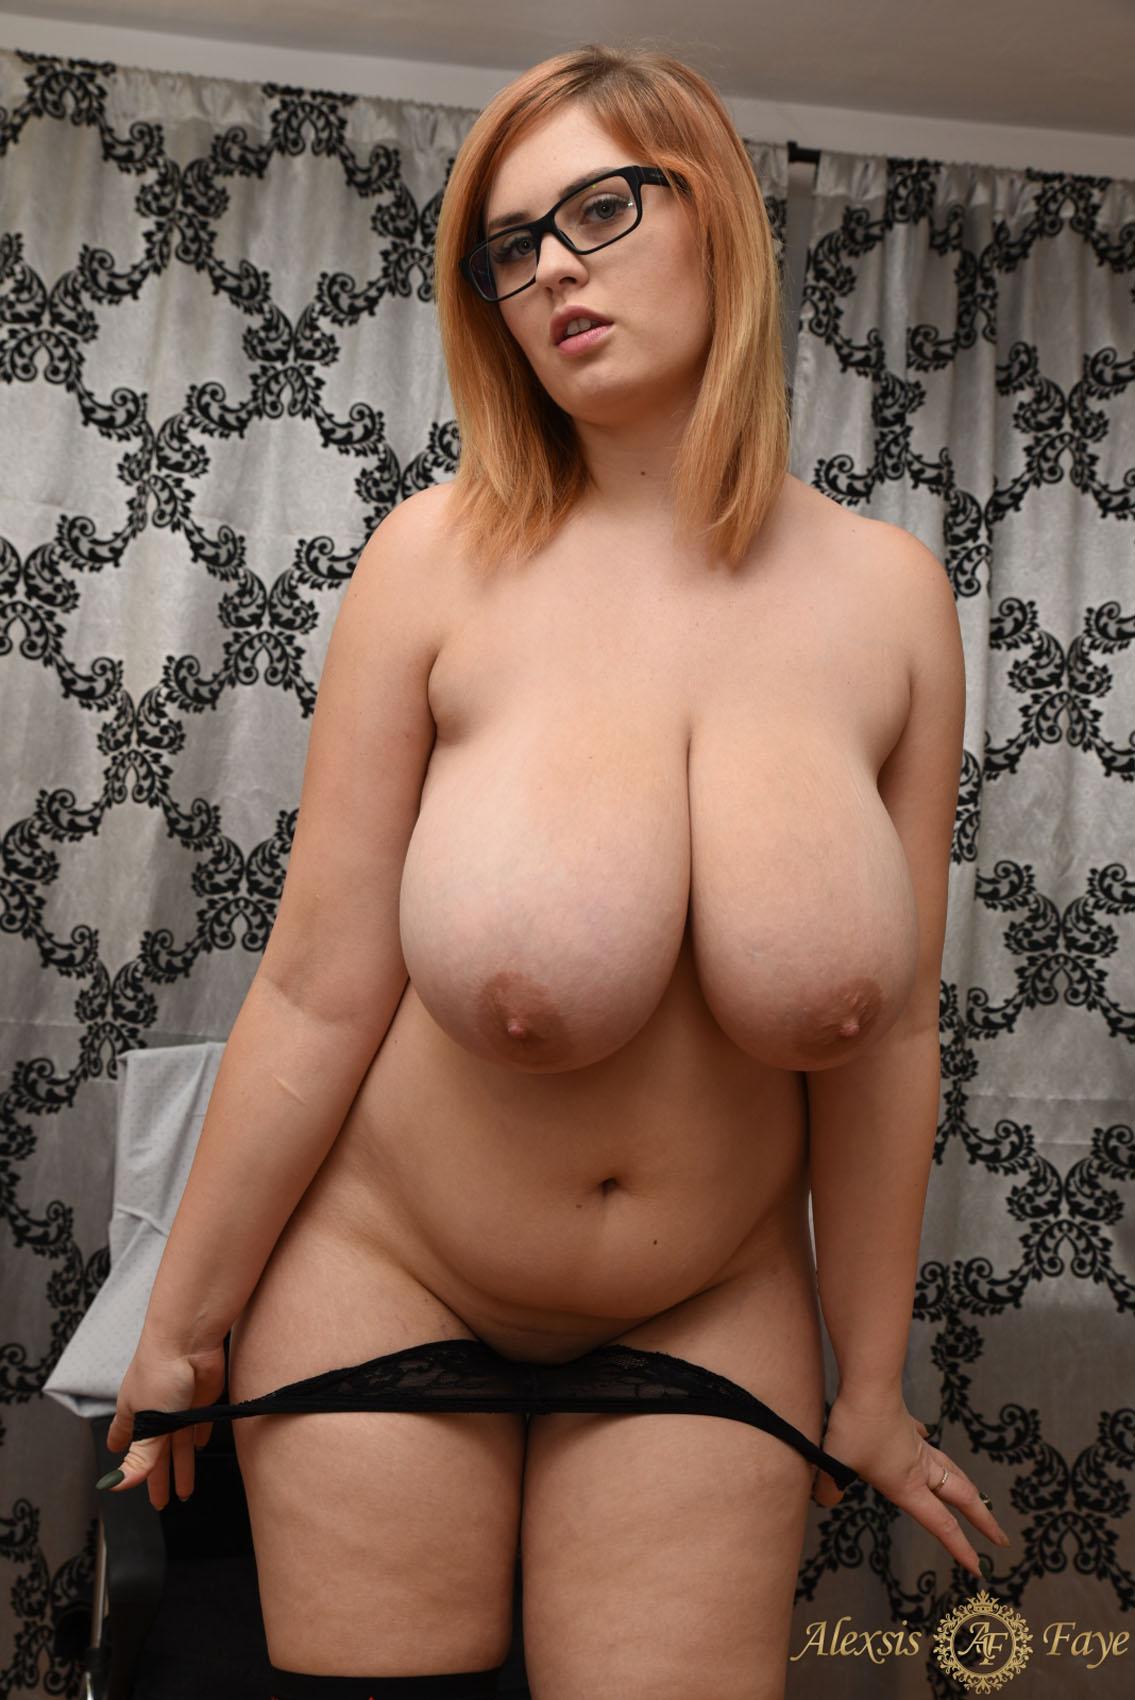 girl-breast-alexa-bbw-busty-model-hazleton